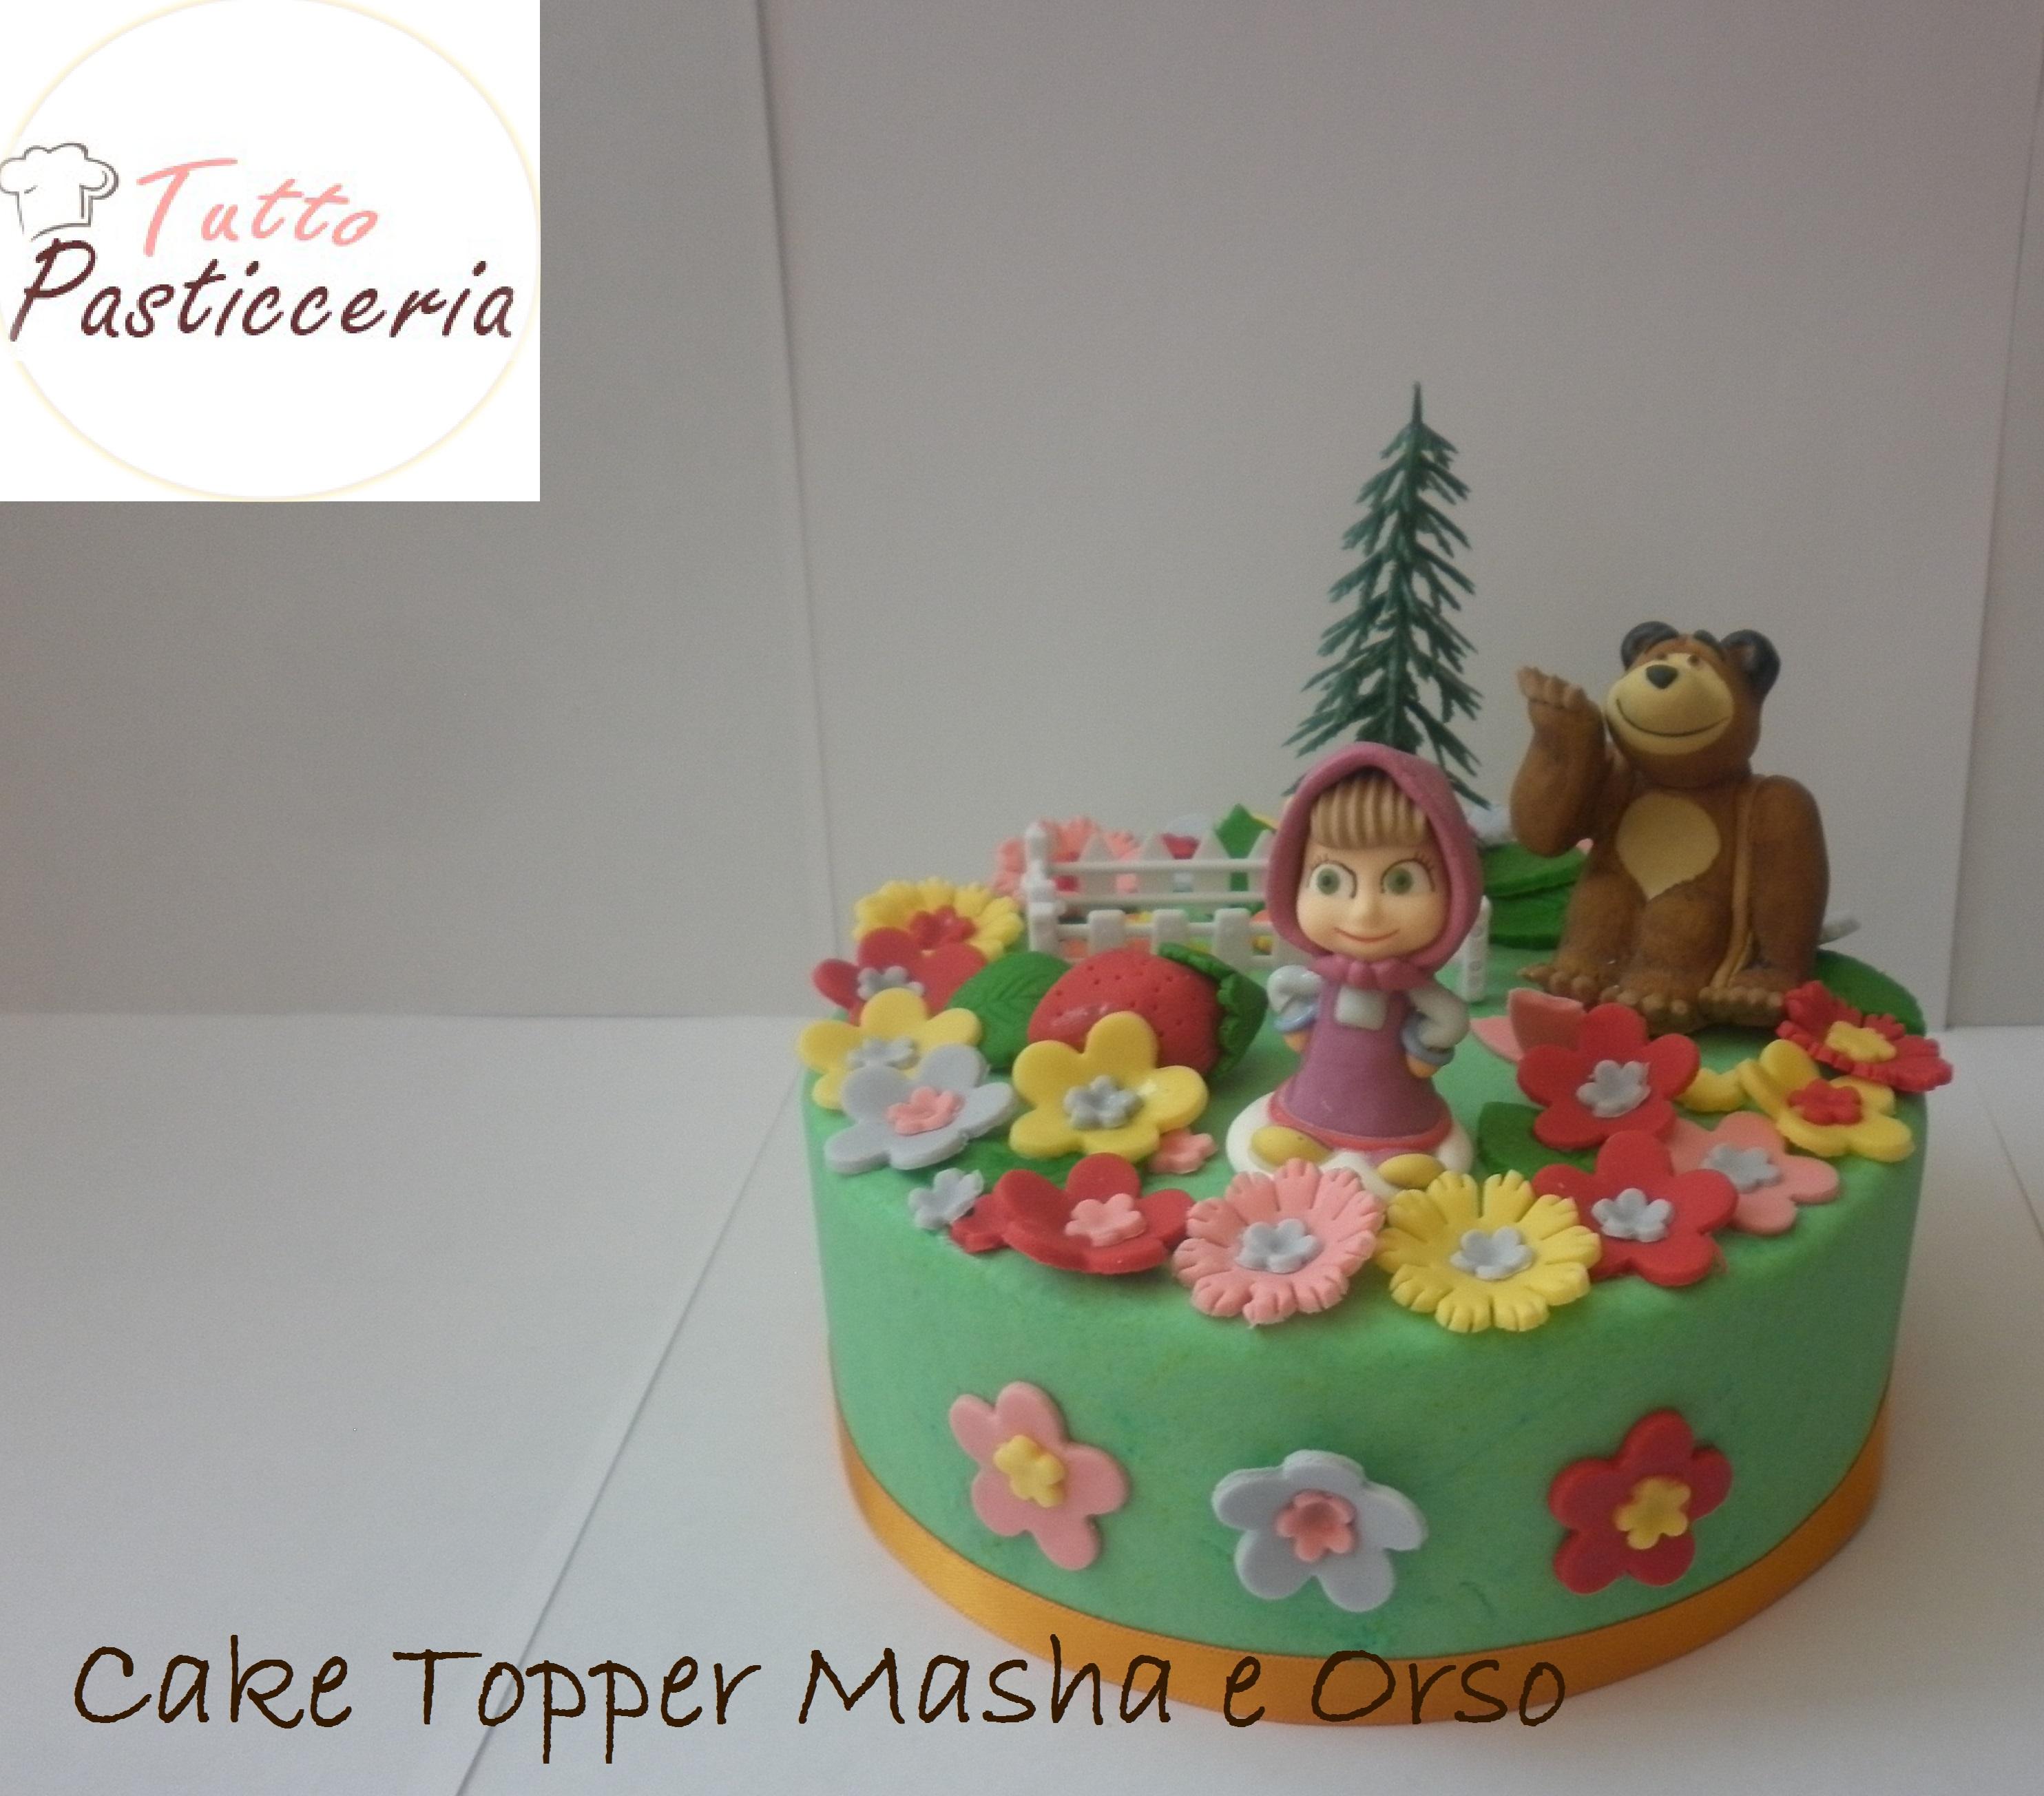 Cake topper per Torta Masha e Orso Pasta di zucchero